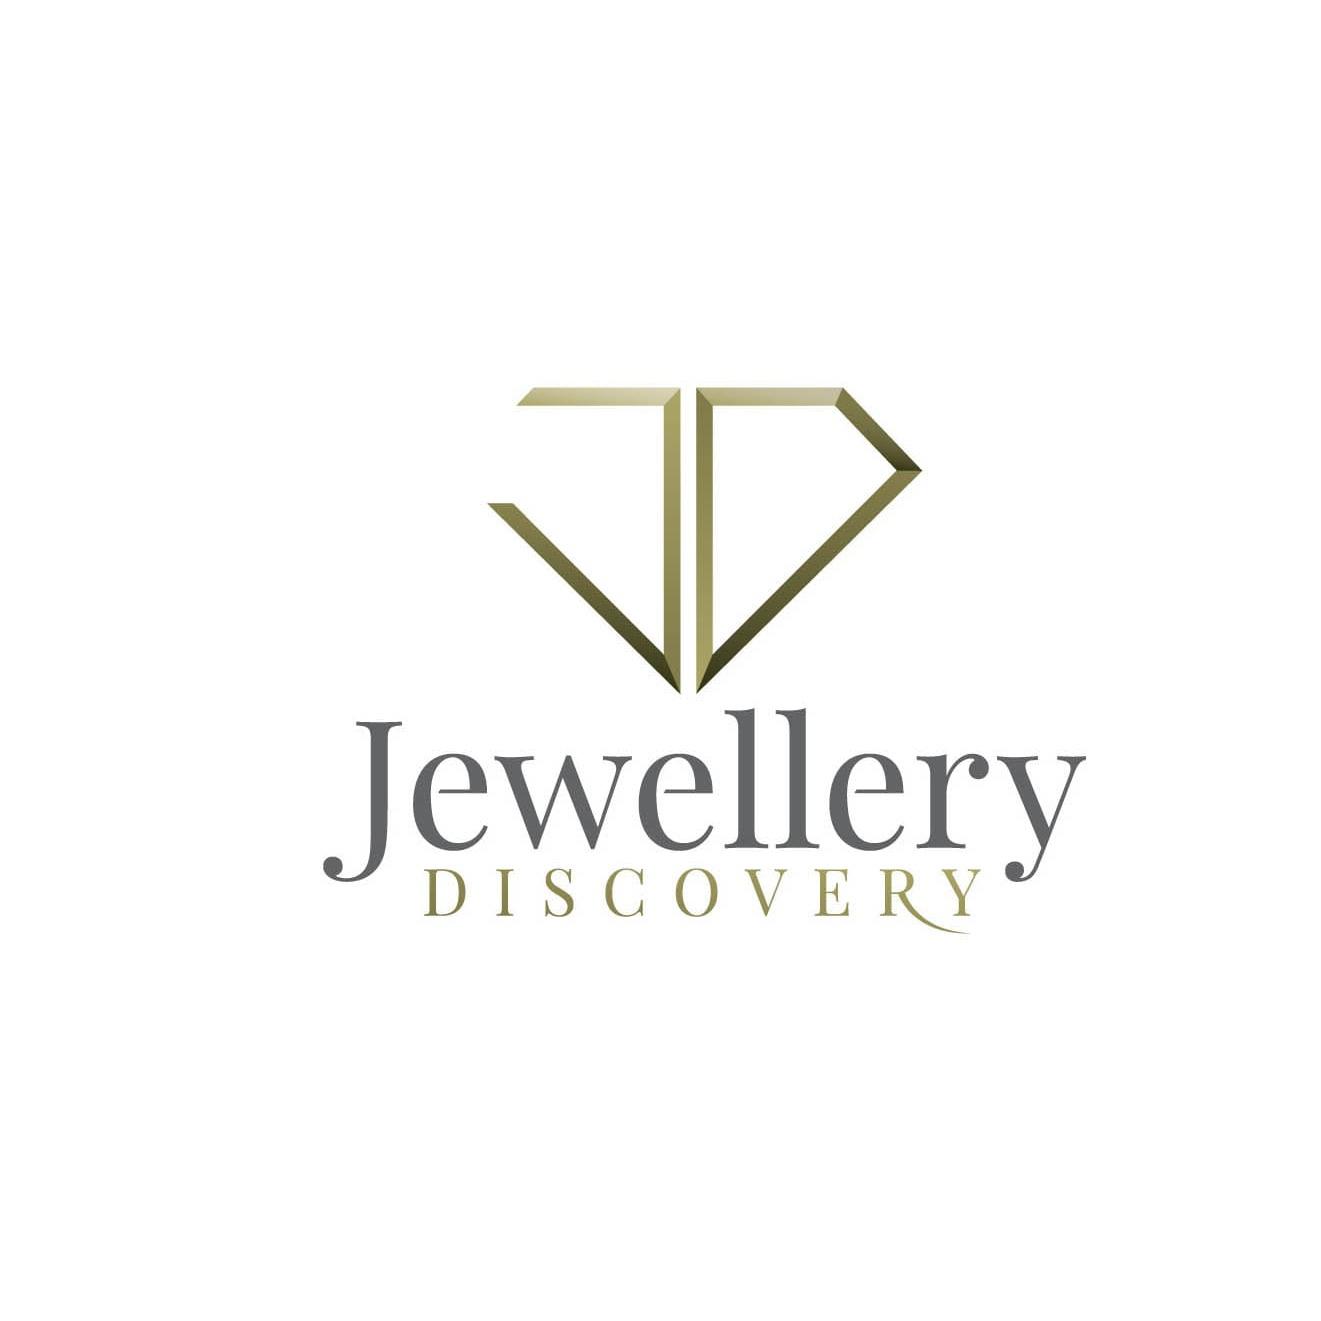 Jewellery Discovery - London, London W1J 0NX - 020 7438 2046   ShowMeLocal.com